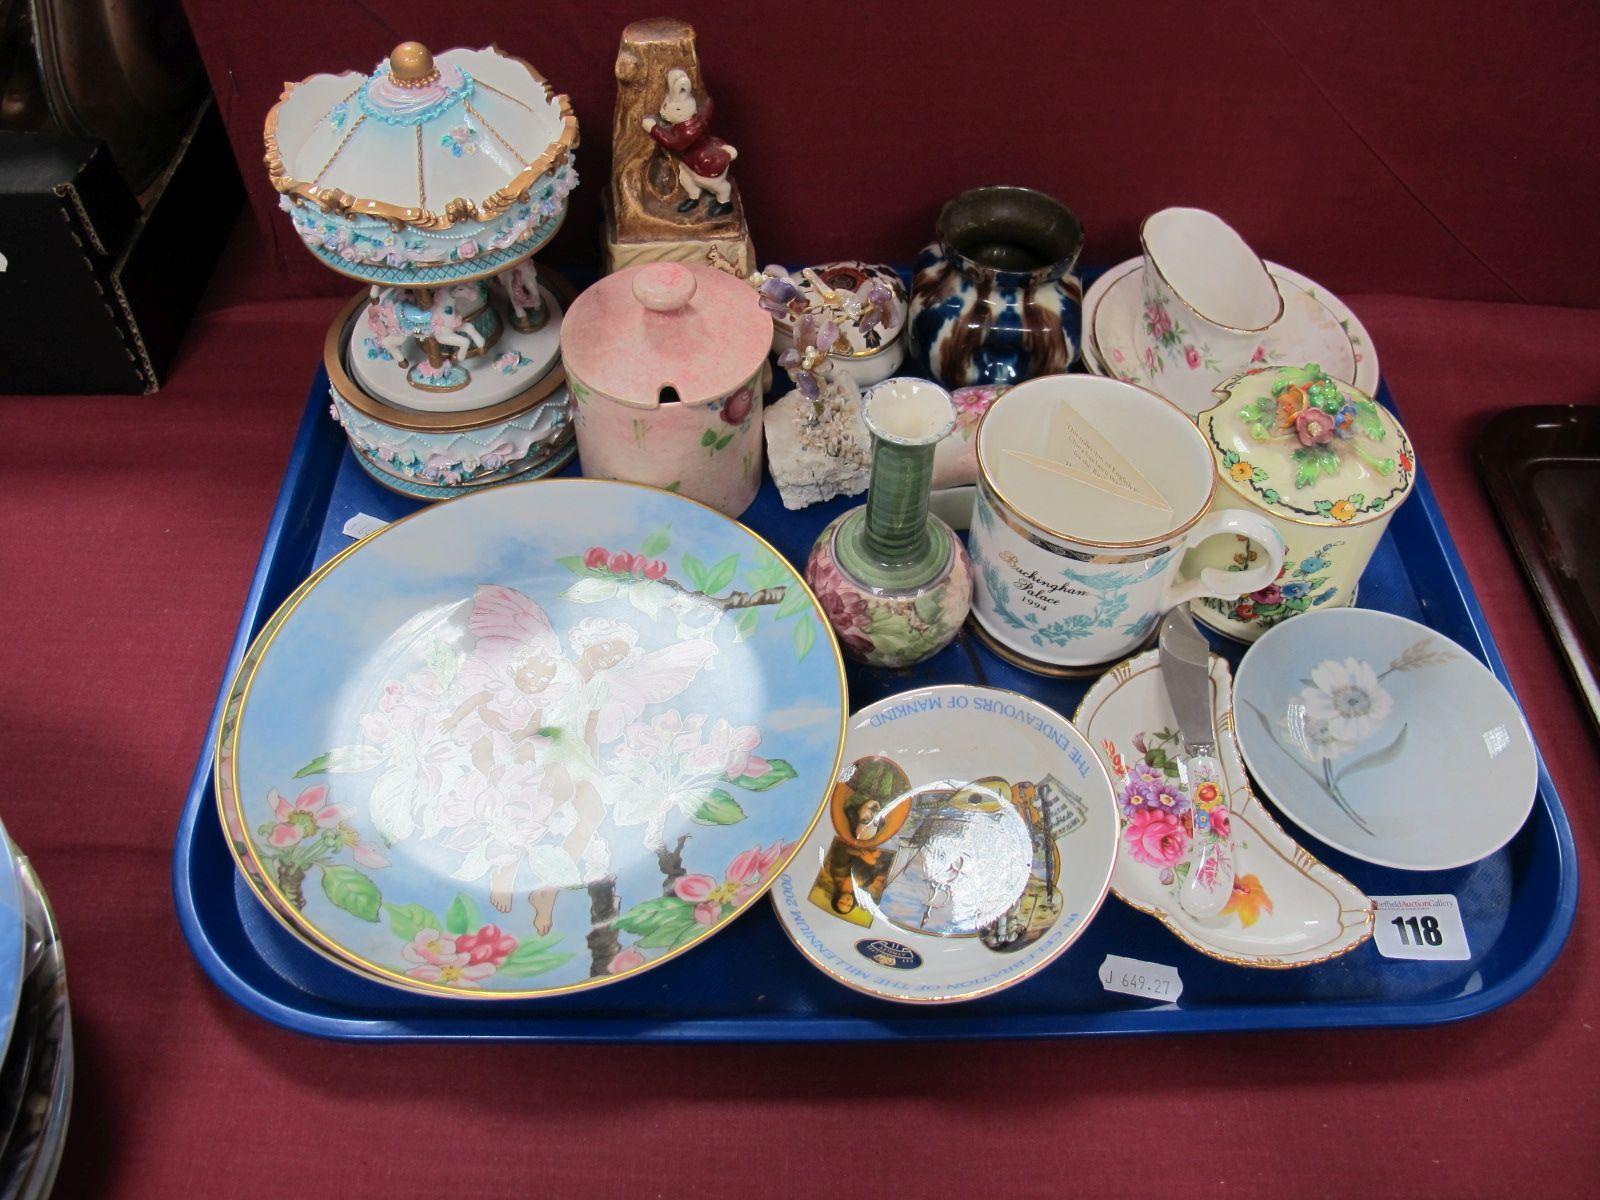 Lot 118 - A Royal Crown Derby Pin Dish, Copenhagen pin dish, Radford preserve pot, Flower Fairies cabinet